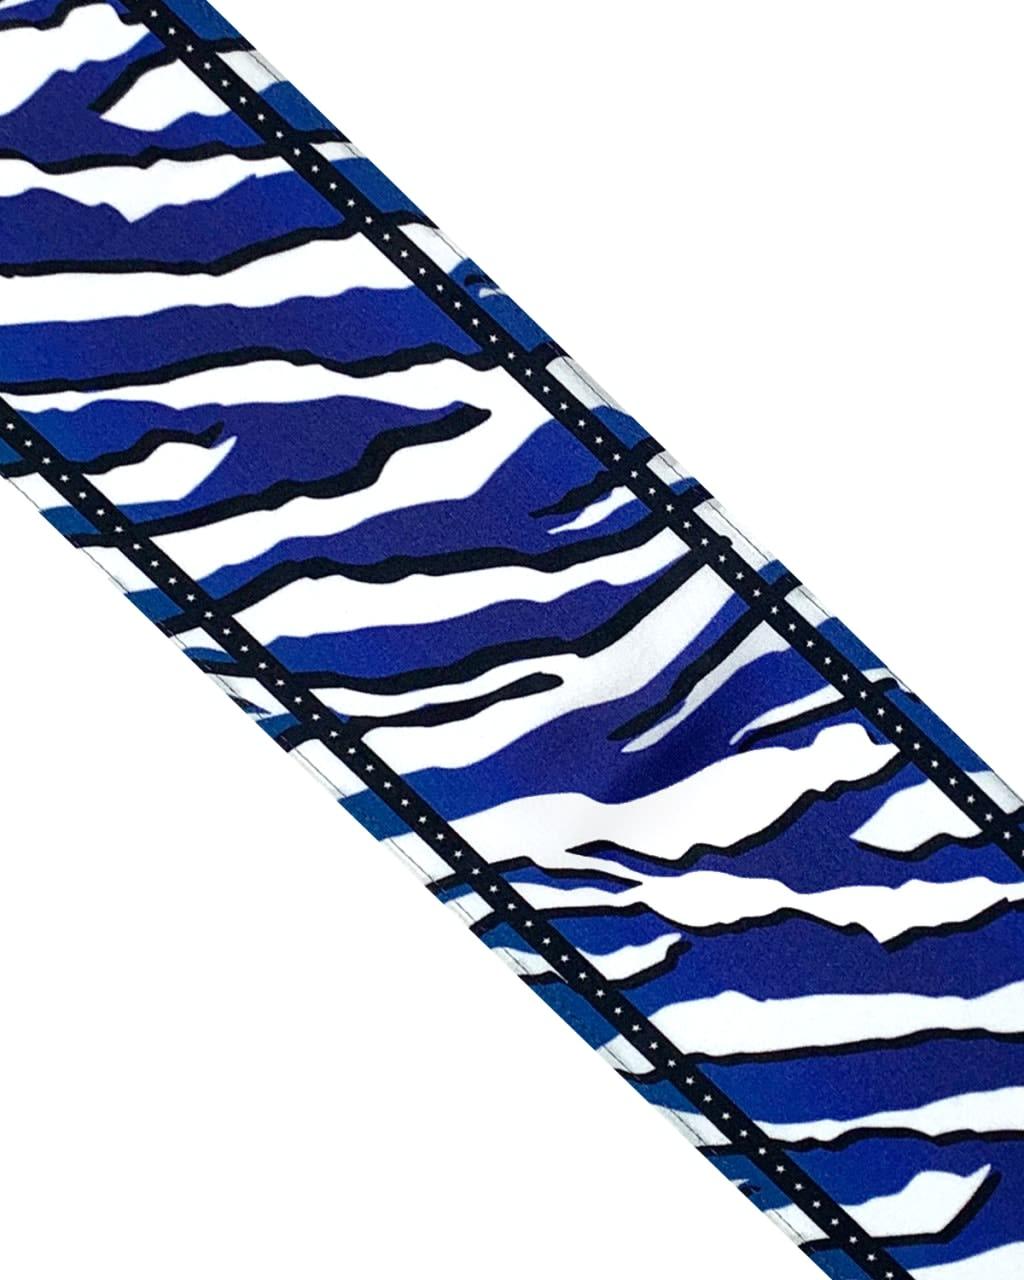 Wild Tiger Silk Neck Scarf Electric Blue